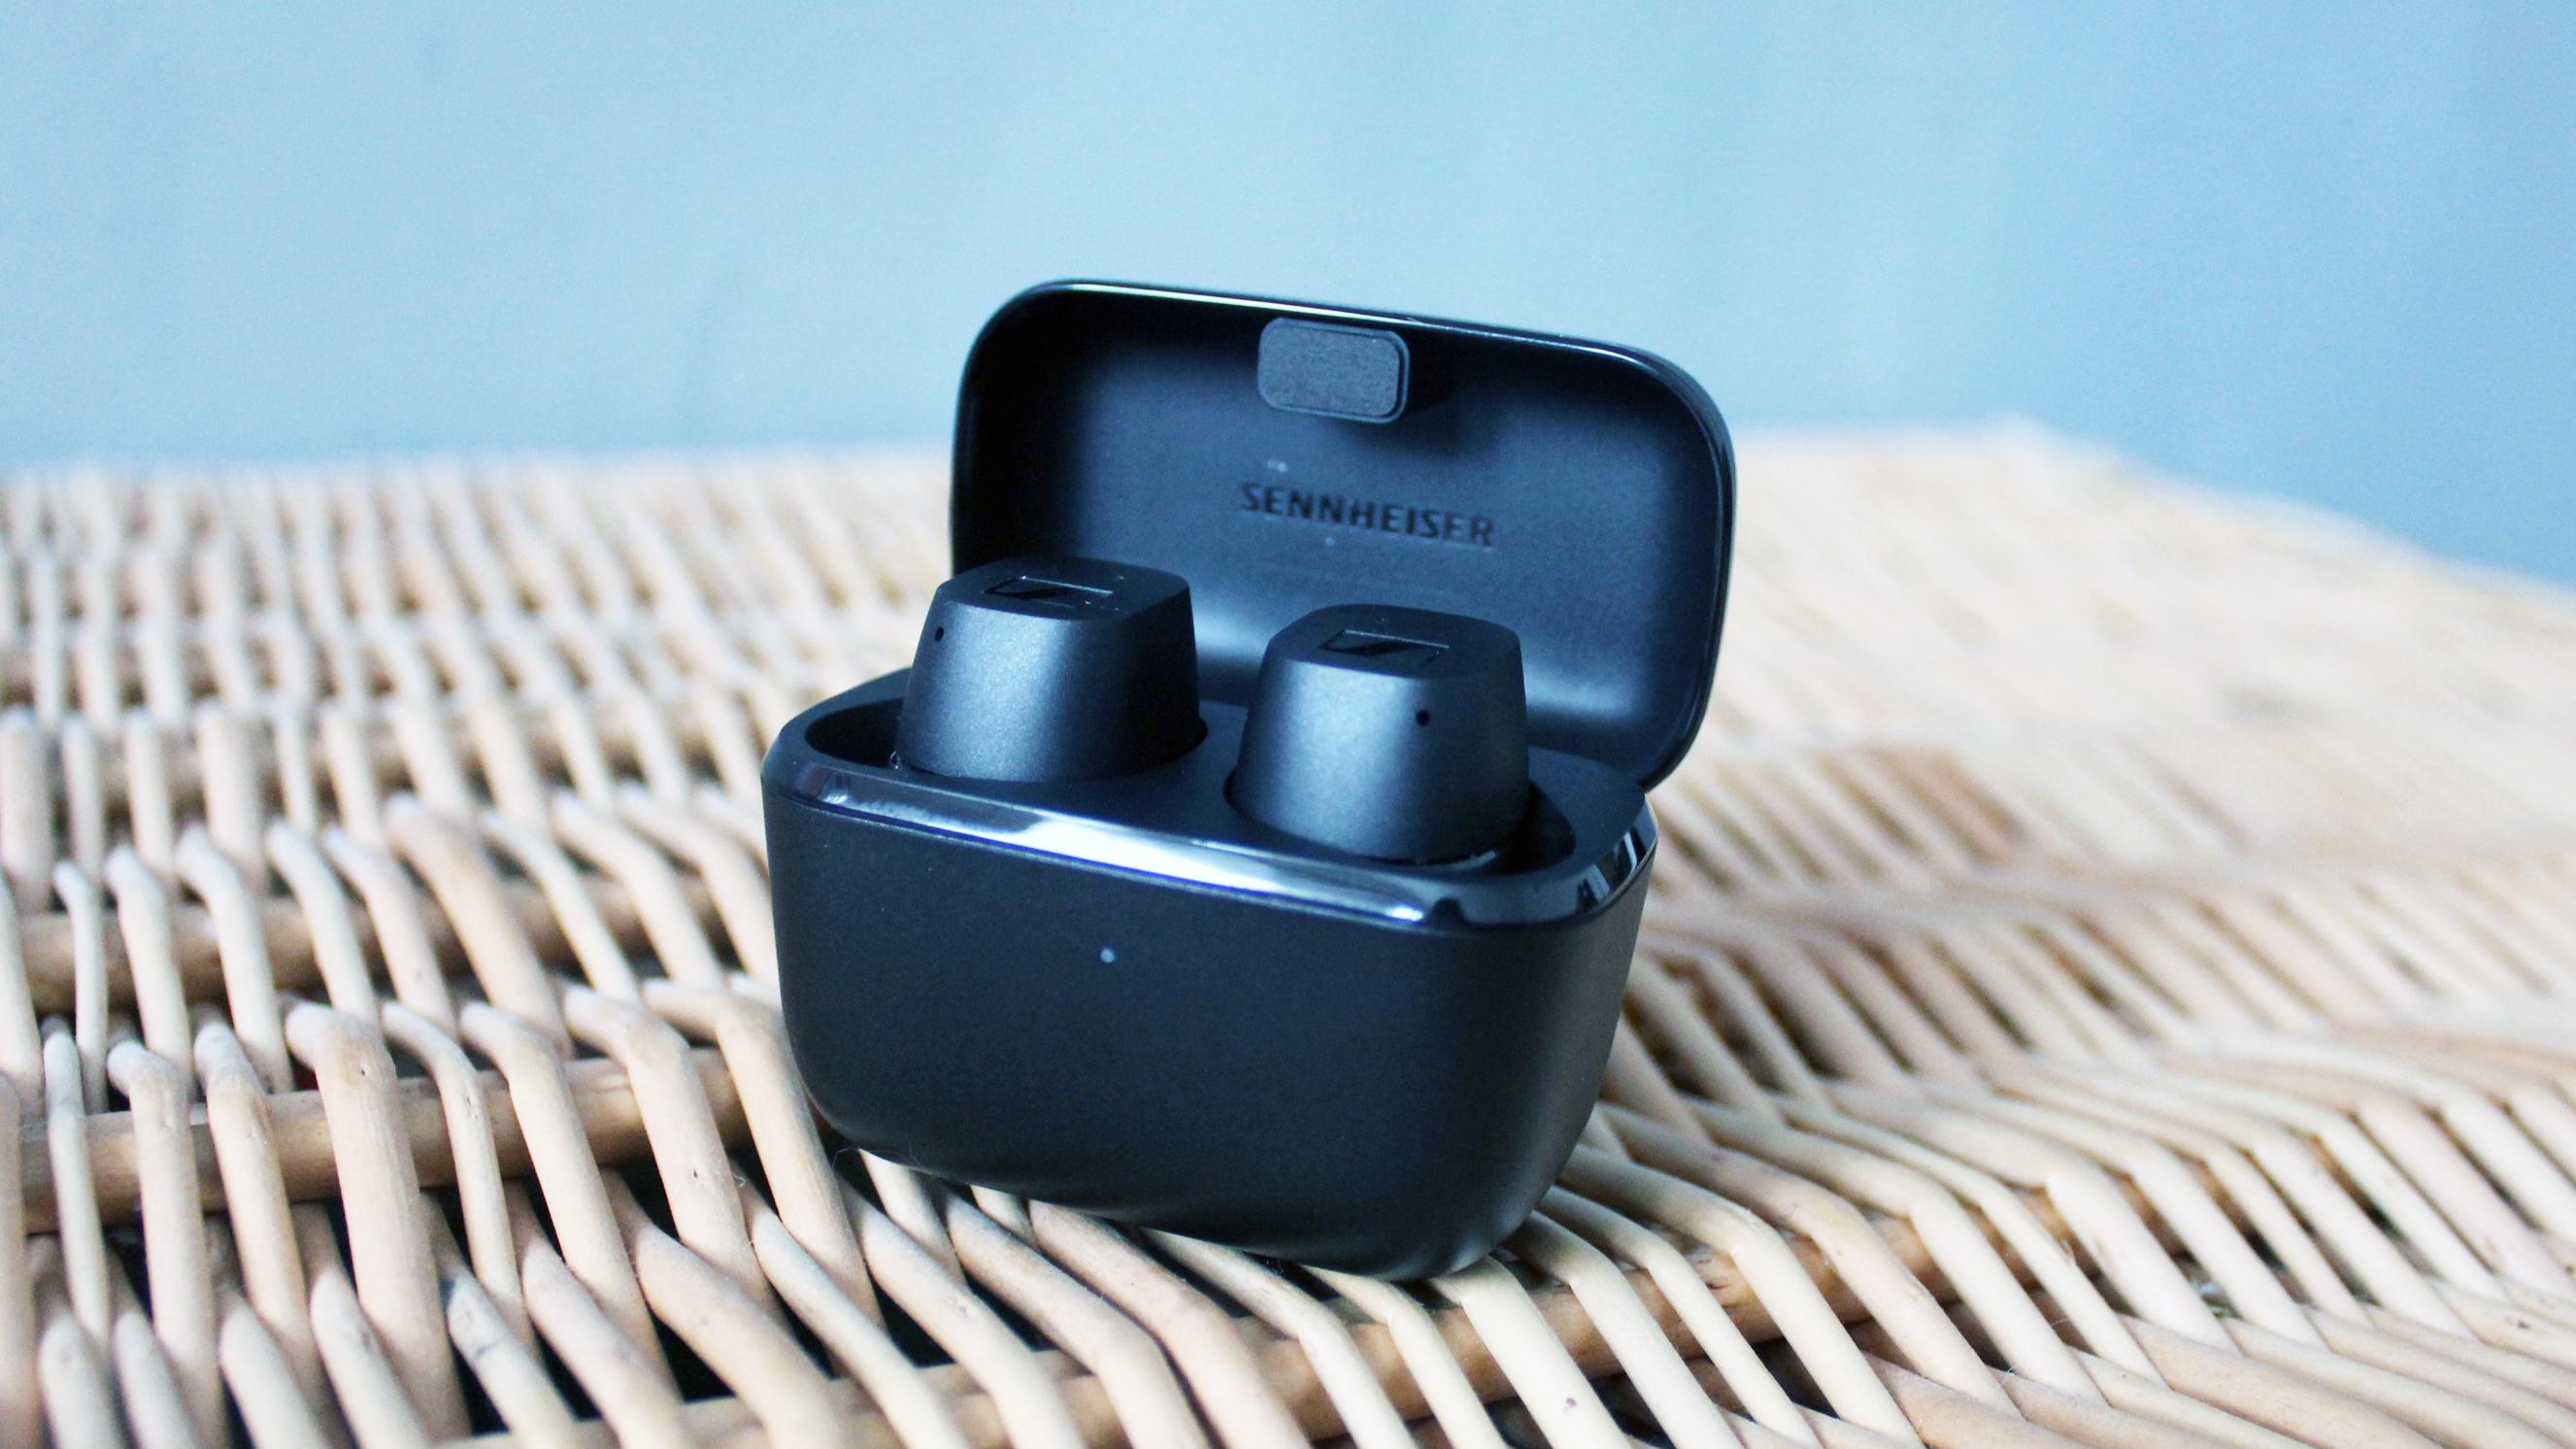 sennheiser cx true wireless earbuds in their charging case on a wicker background